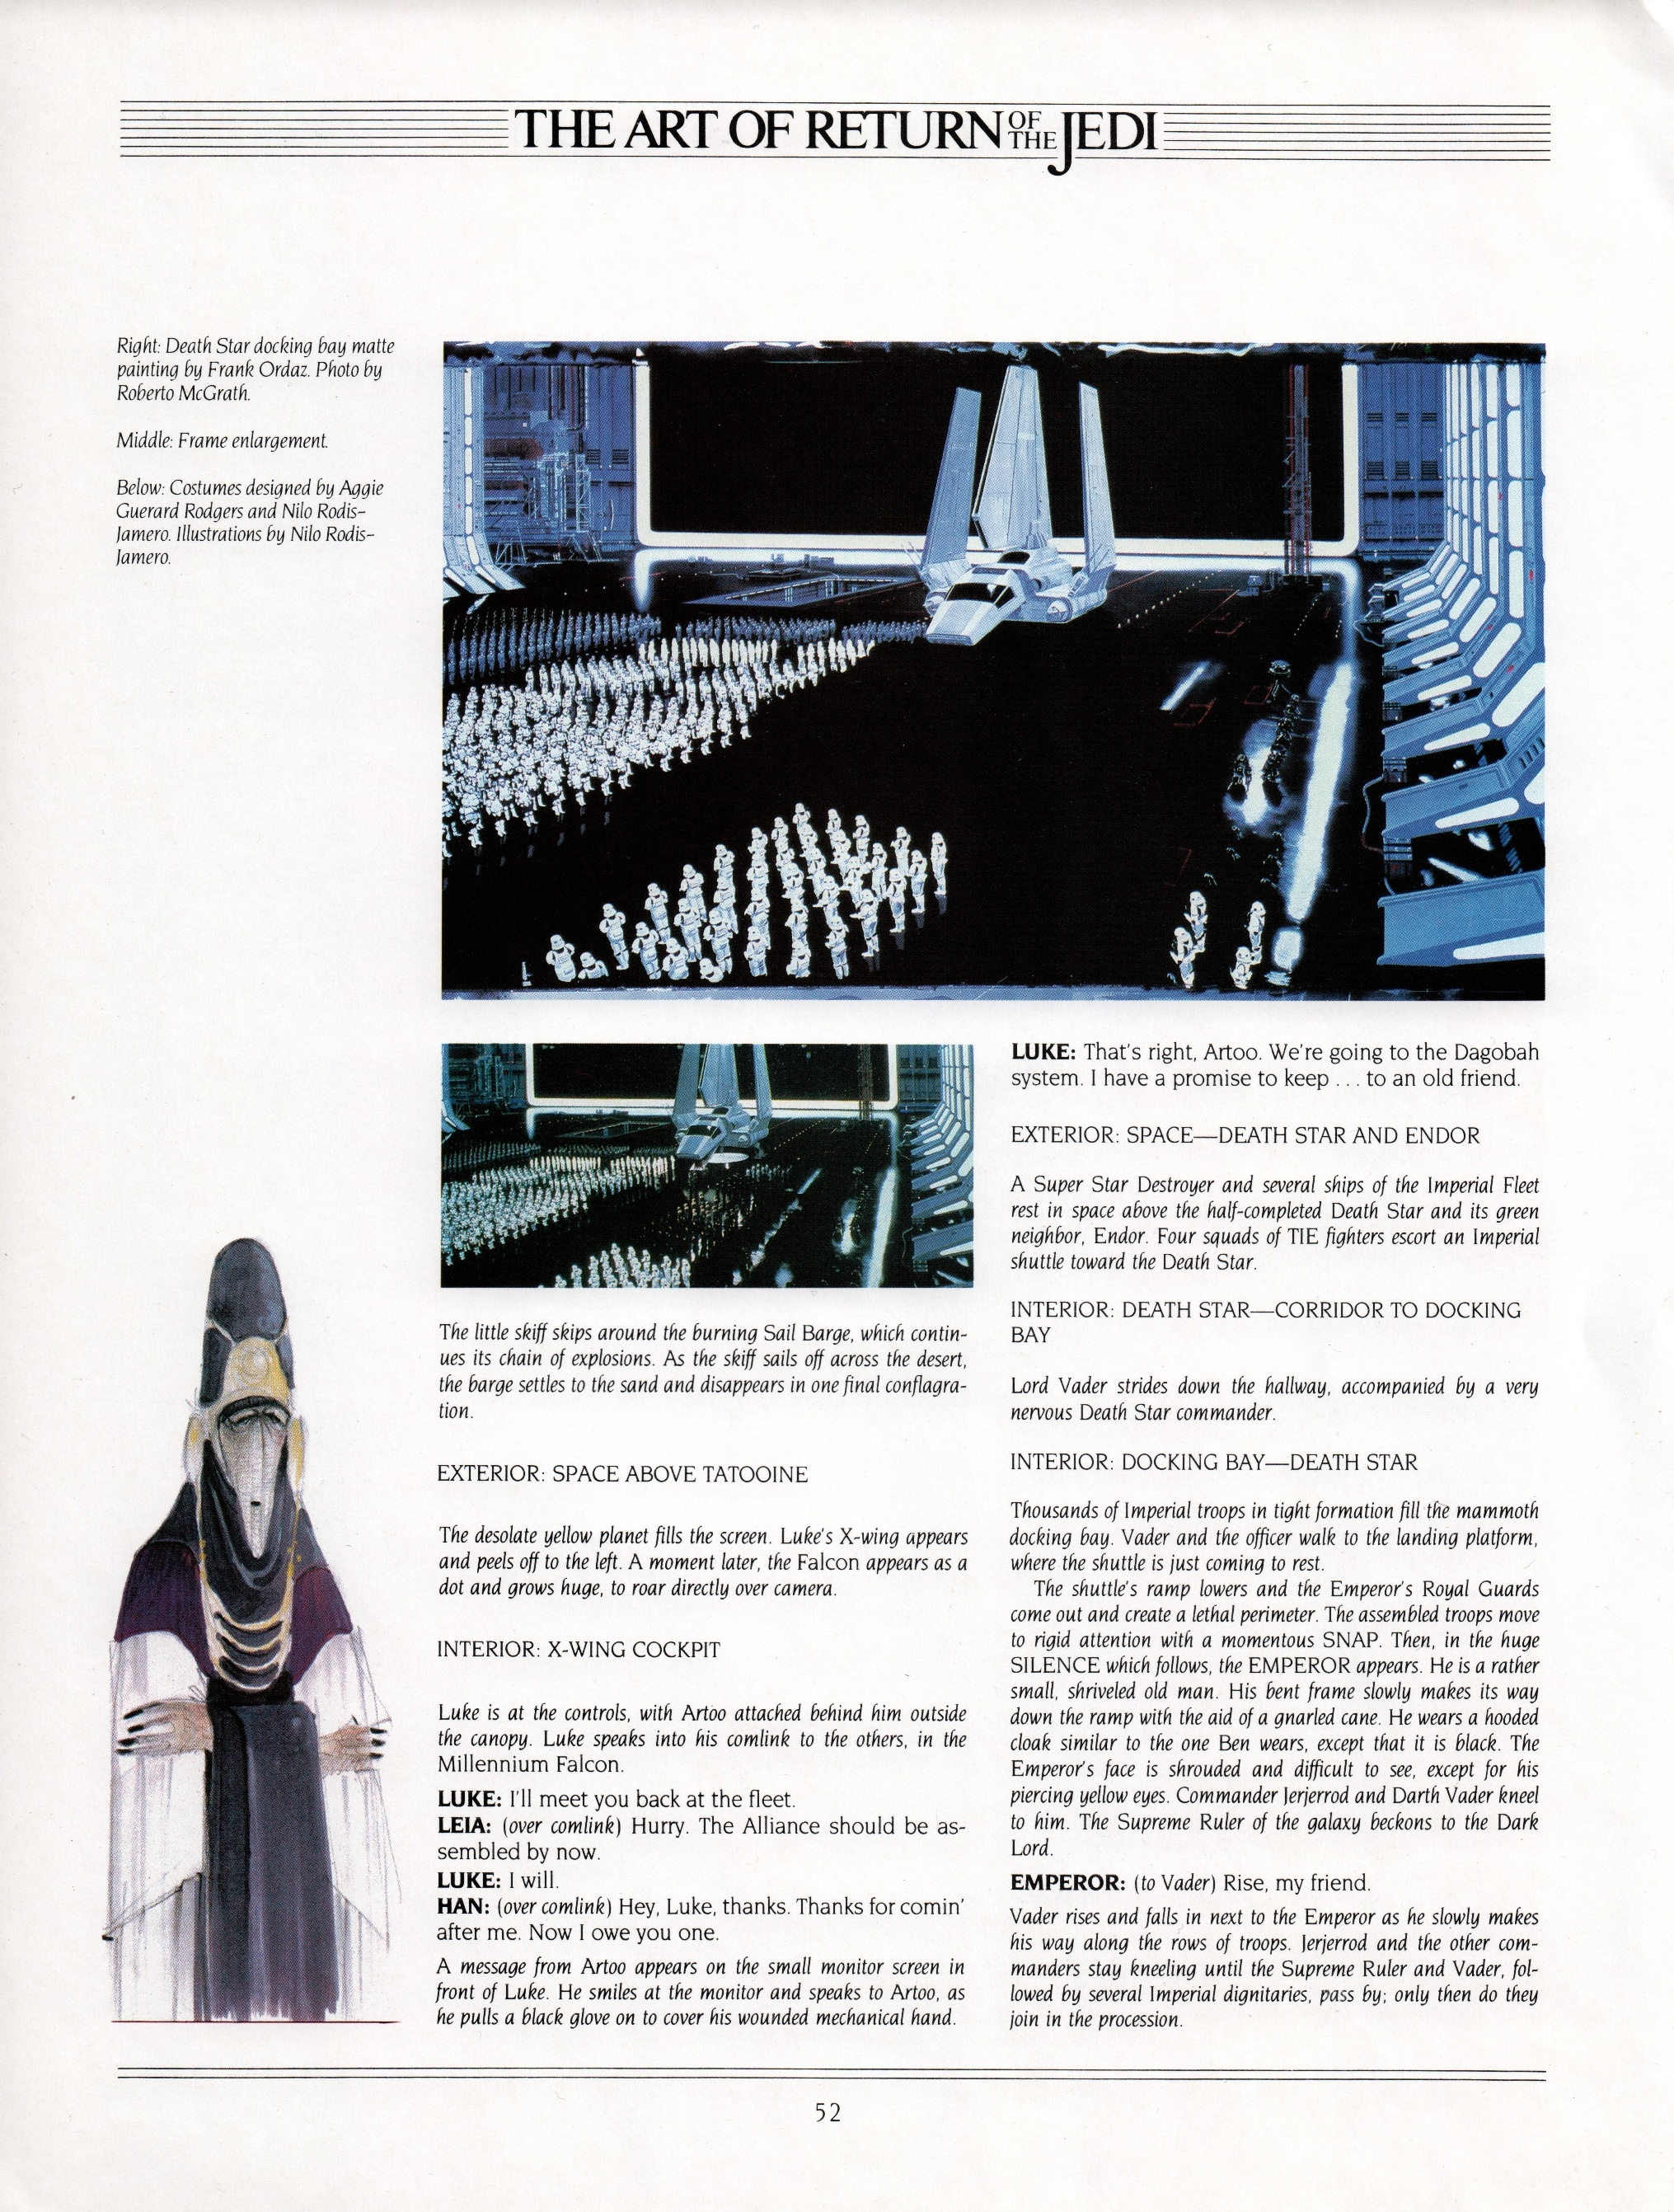 Art of Return of the Jedi (b0bafett_Empire)-p052